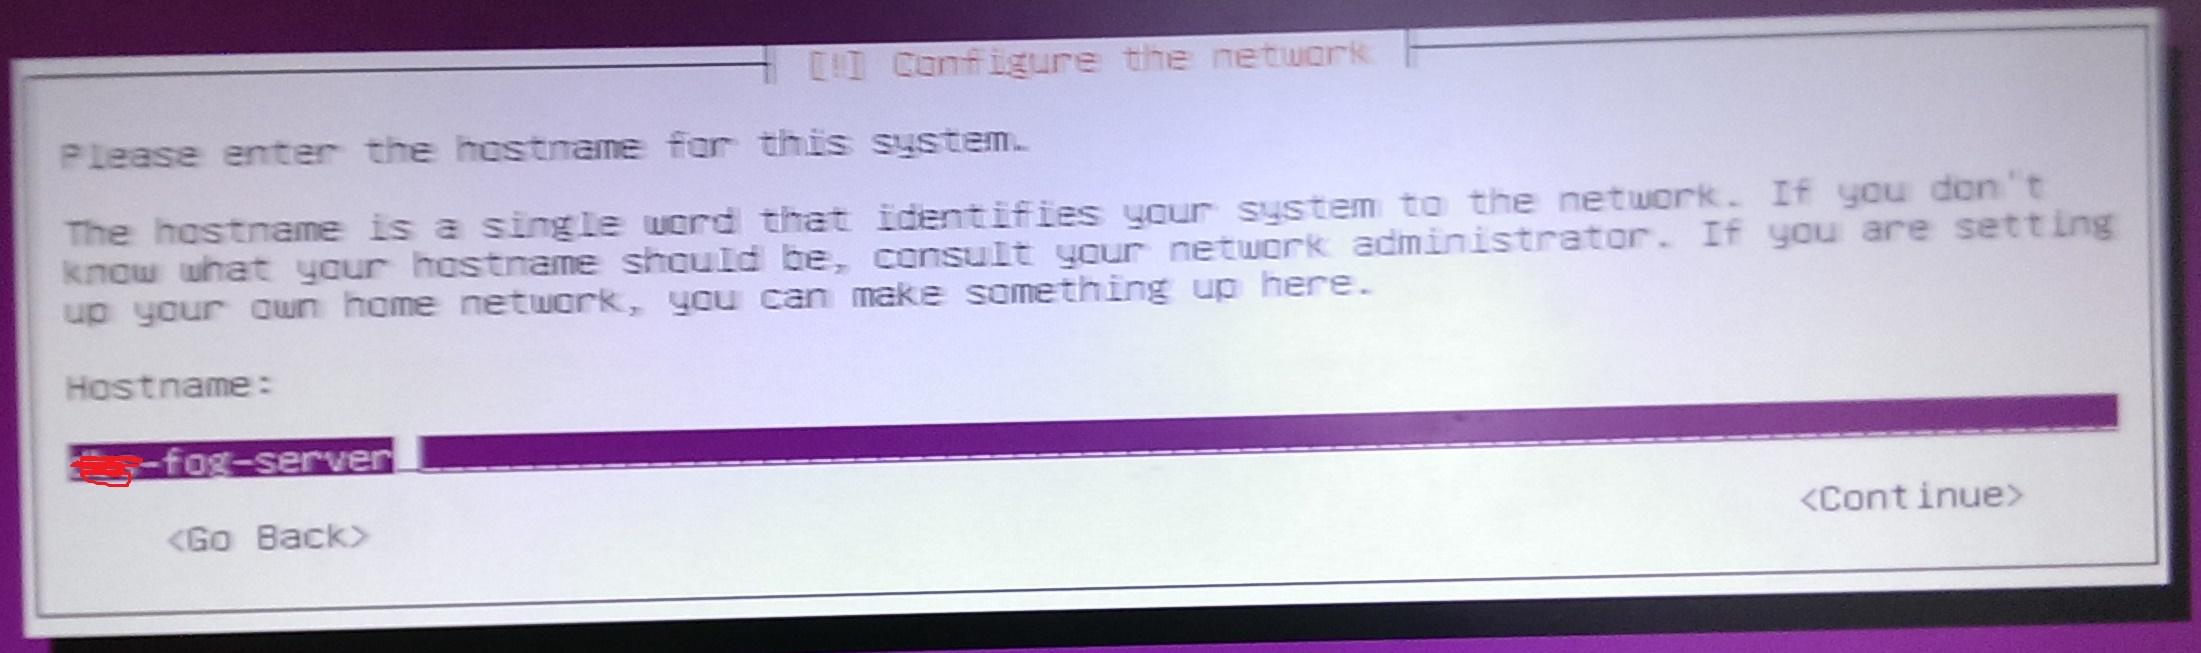 Ubuntu Server IP setup